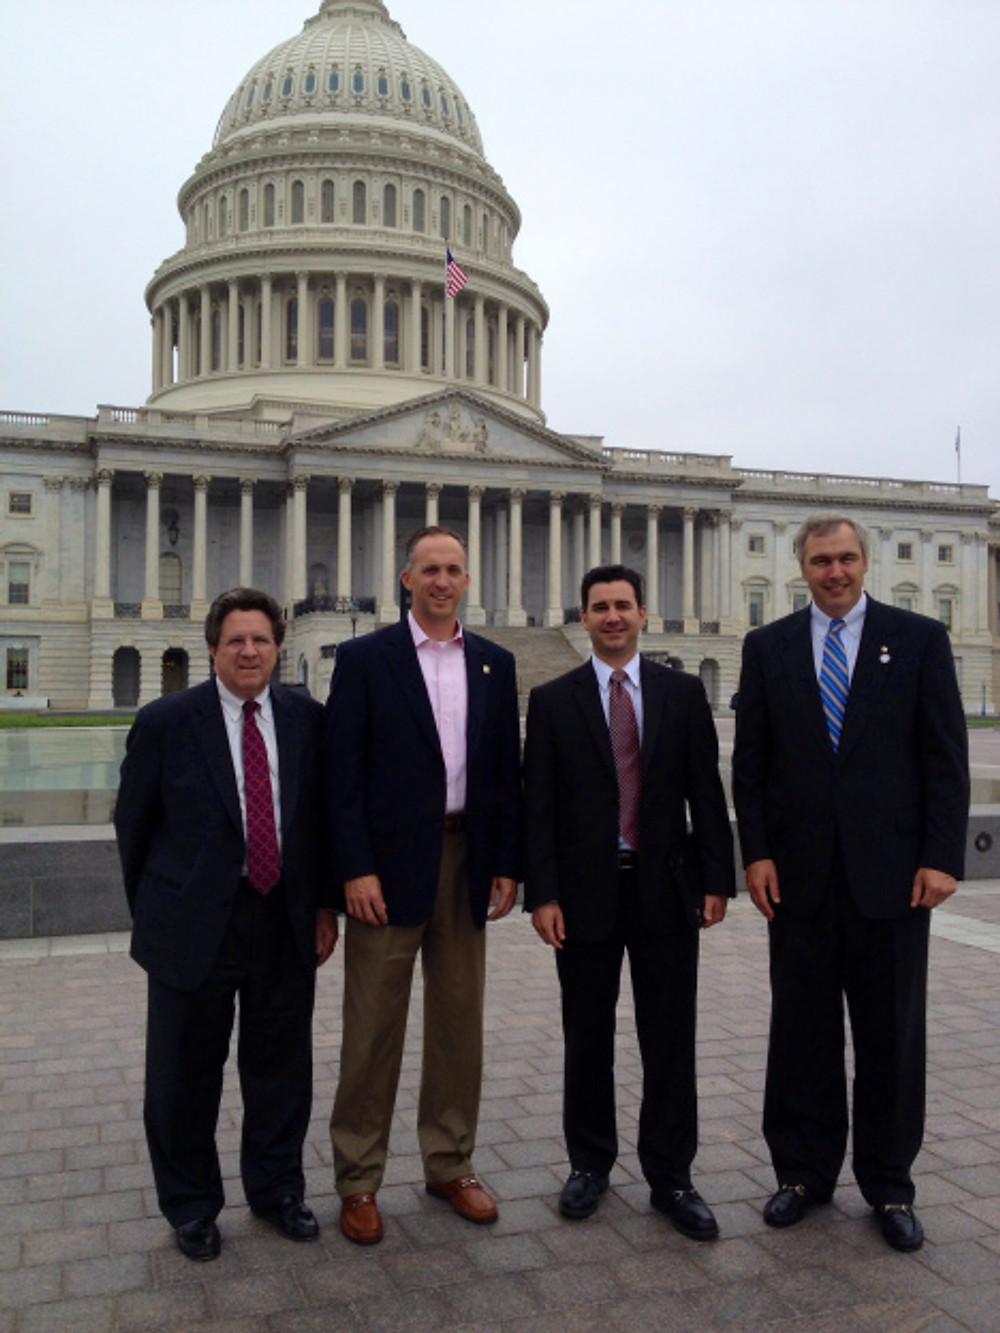 Charlotte  members Eric Locher, Joe Rempson, Scott Wurzbacher and Paisley Gordon on Capitol Hill